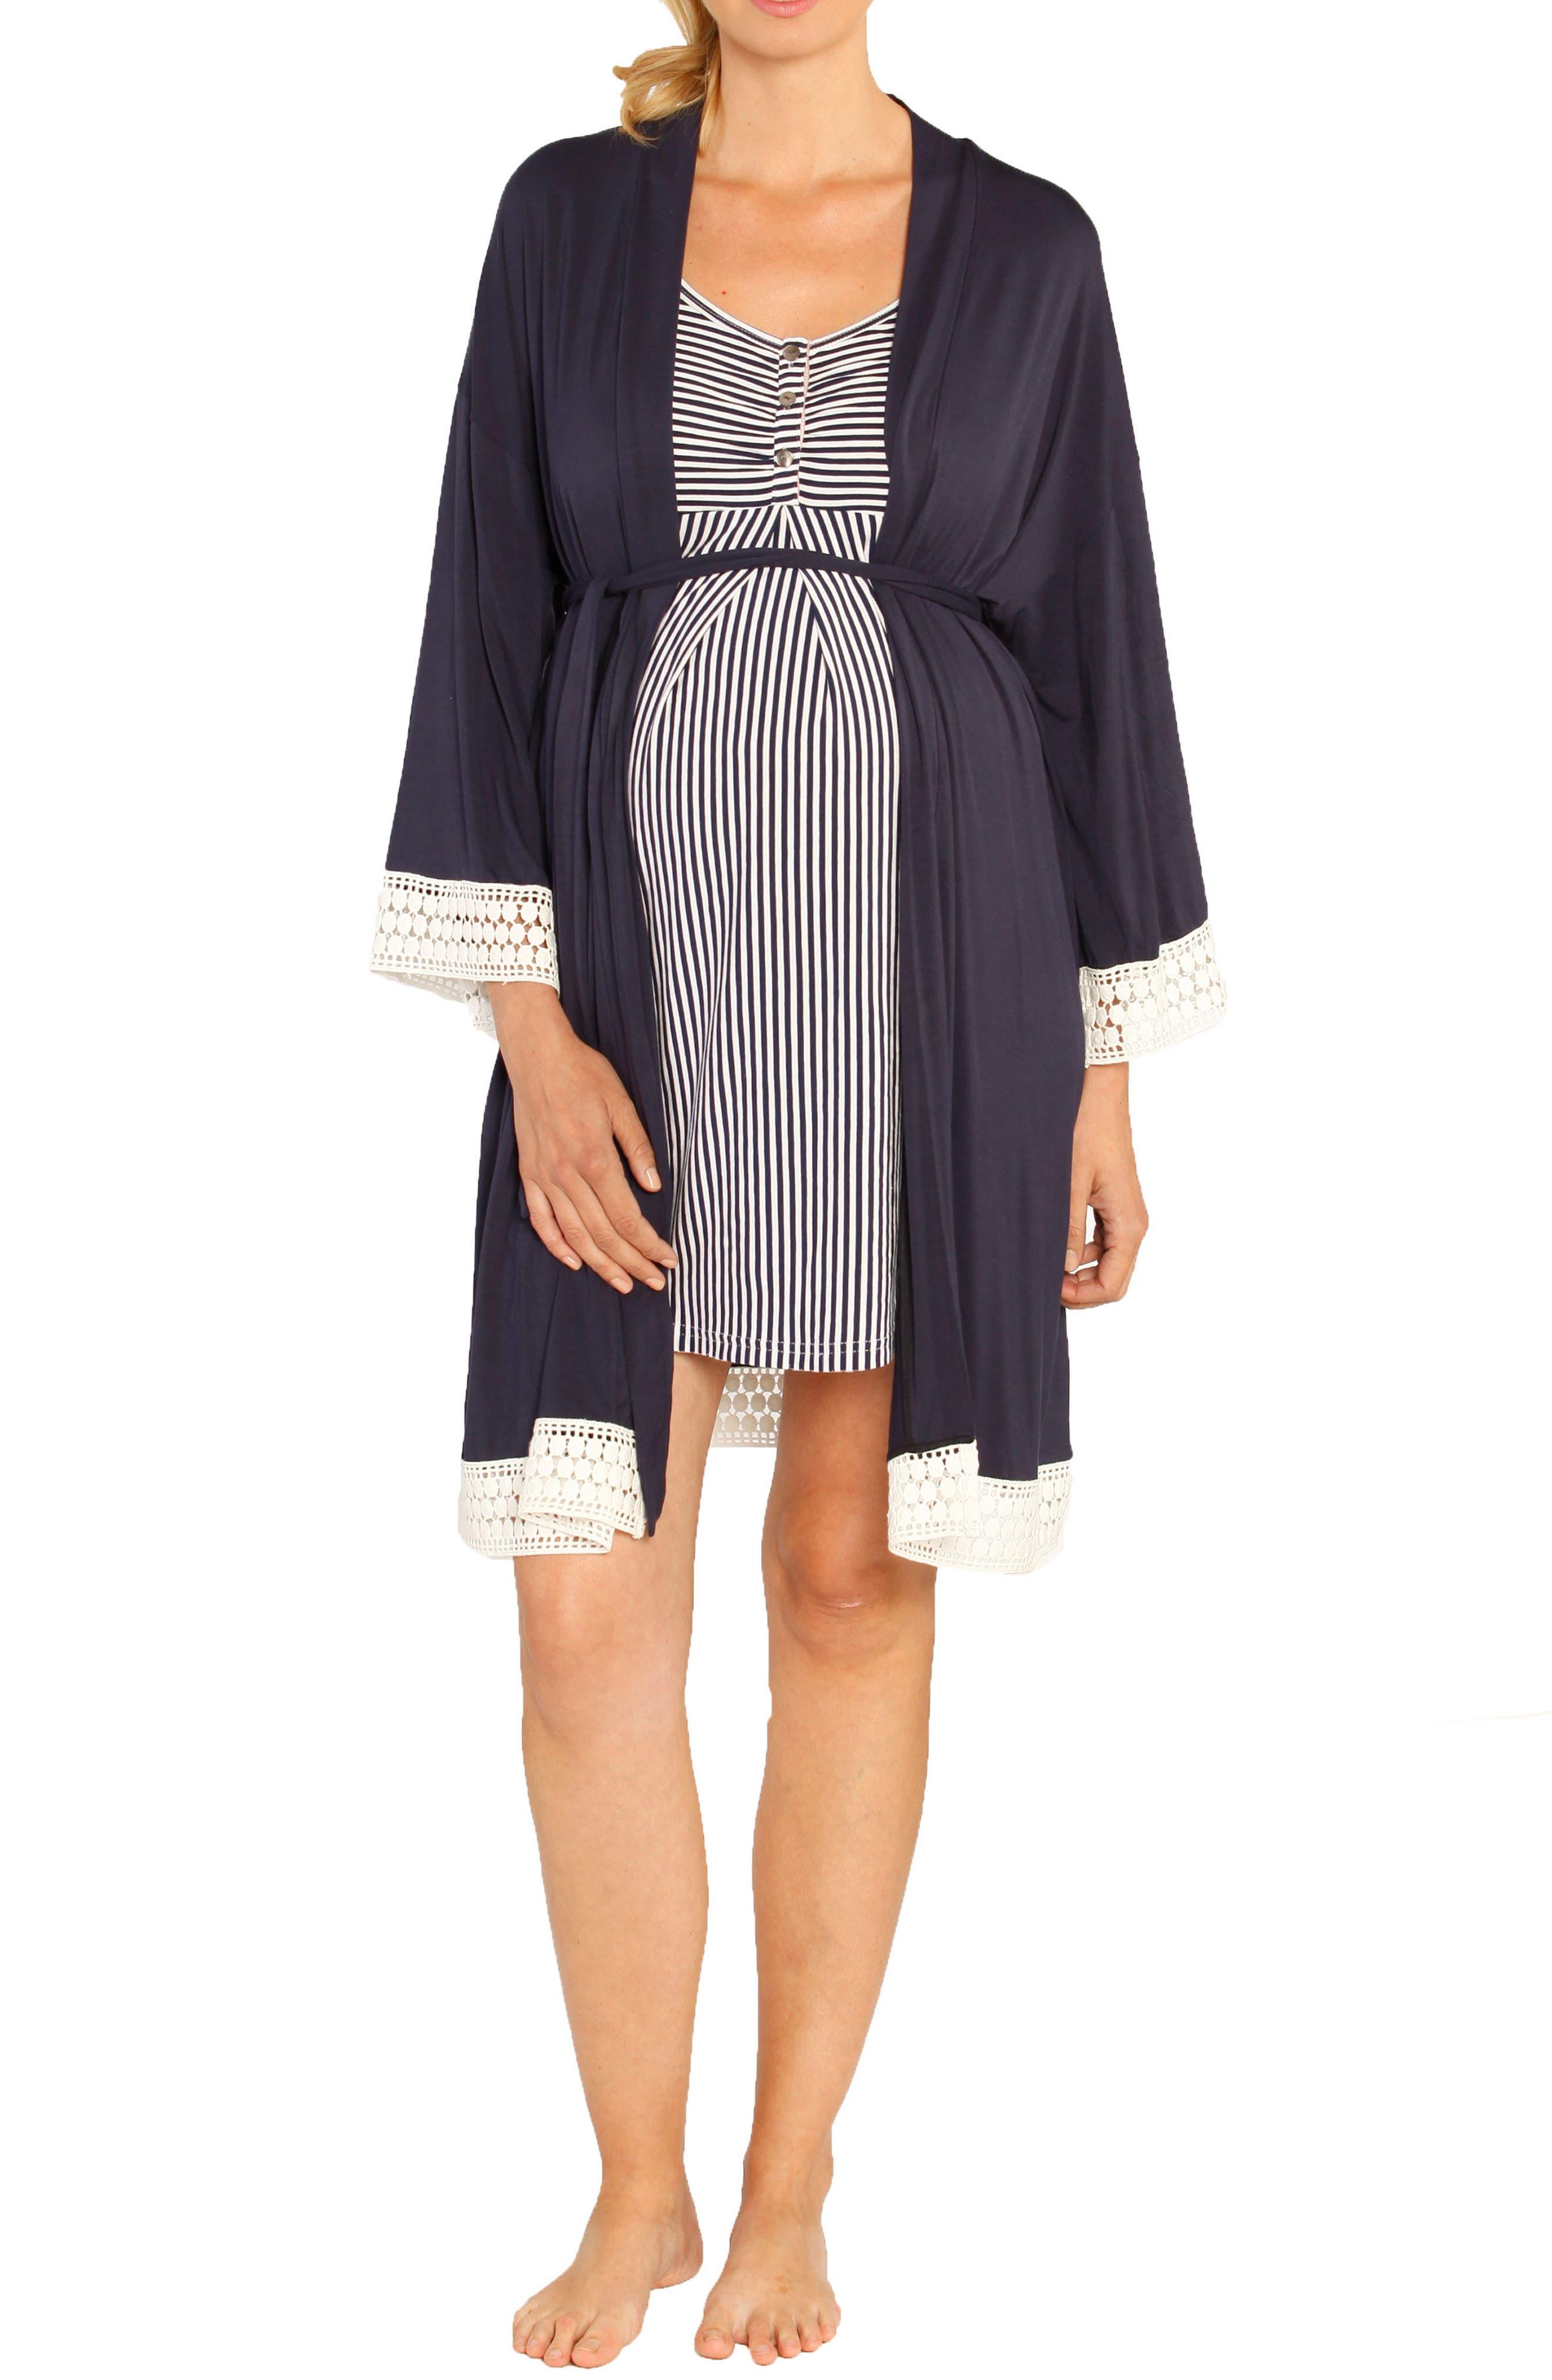 Nursing Dress, Robe & Baby Blanket Pouch Set,                             Alternate thumbnail 4, color,                             NAVY STRIPES